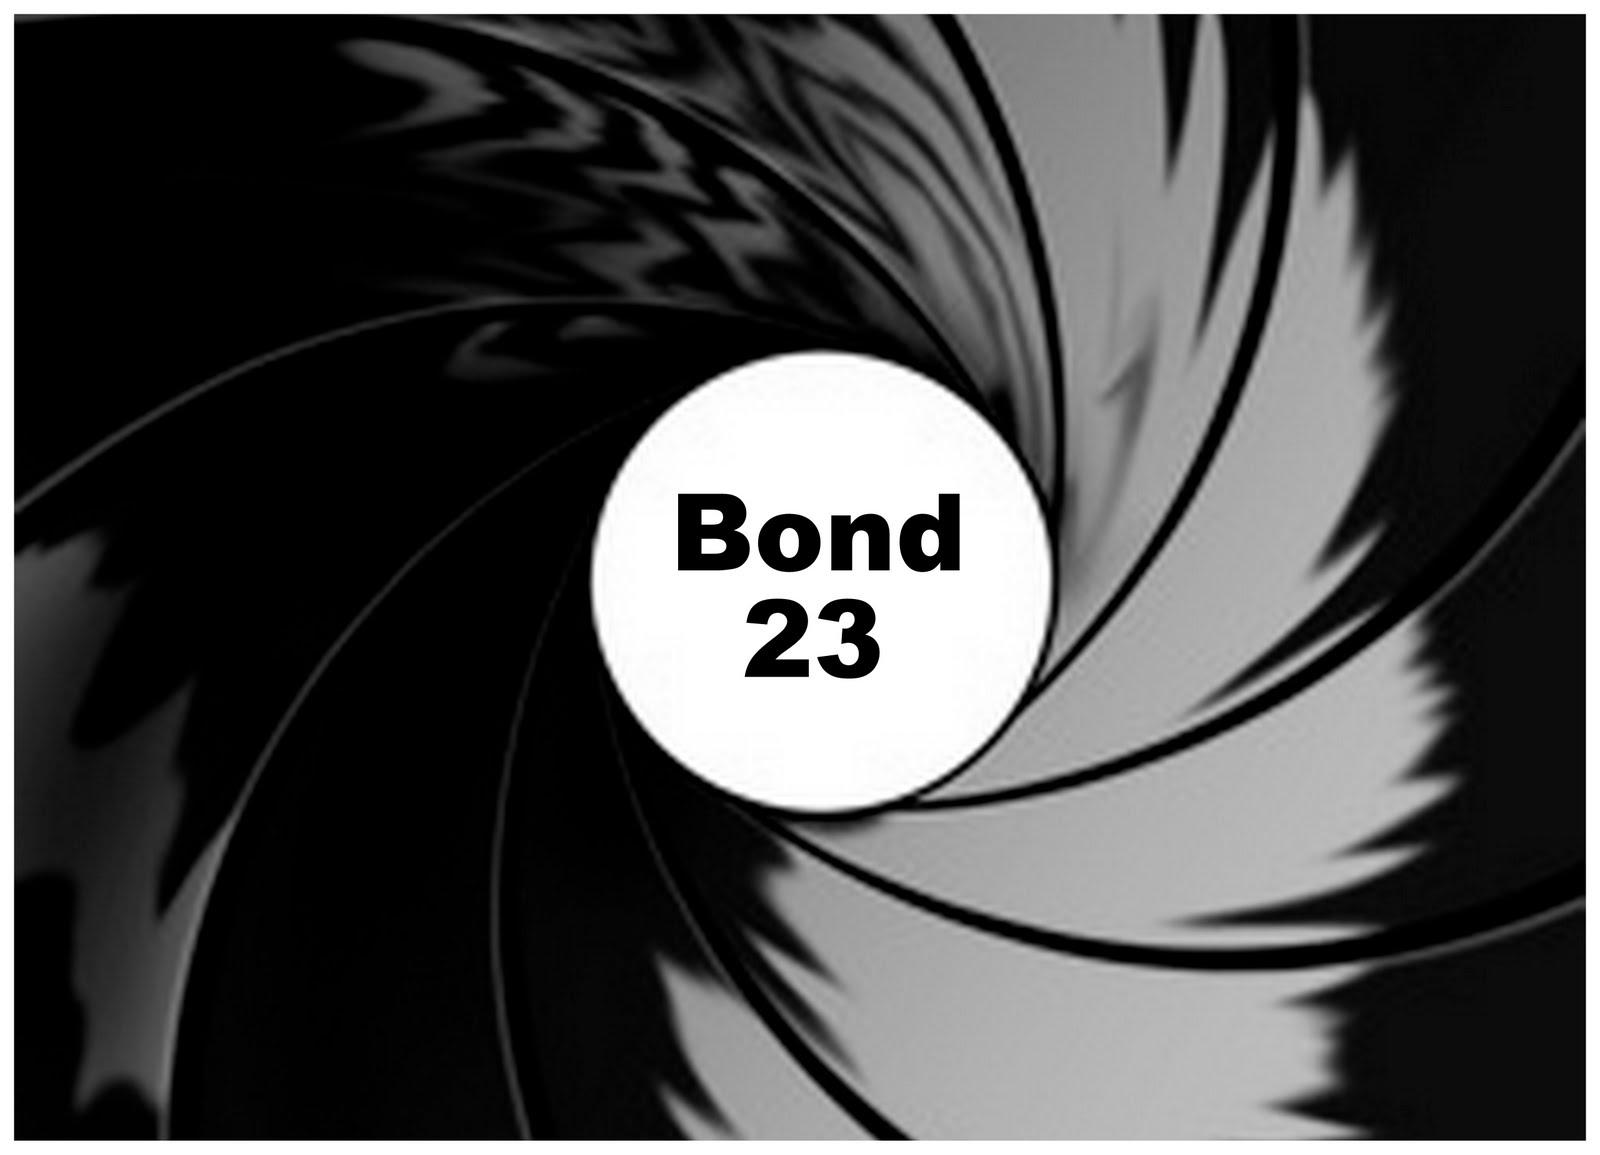 http://4.bp.blogspot.com/_KJLhUch4D5Y/TDydBGEdHXI/AAAAAAAAArI/VxfR13shFcY/s1600/Bond+23.jpg